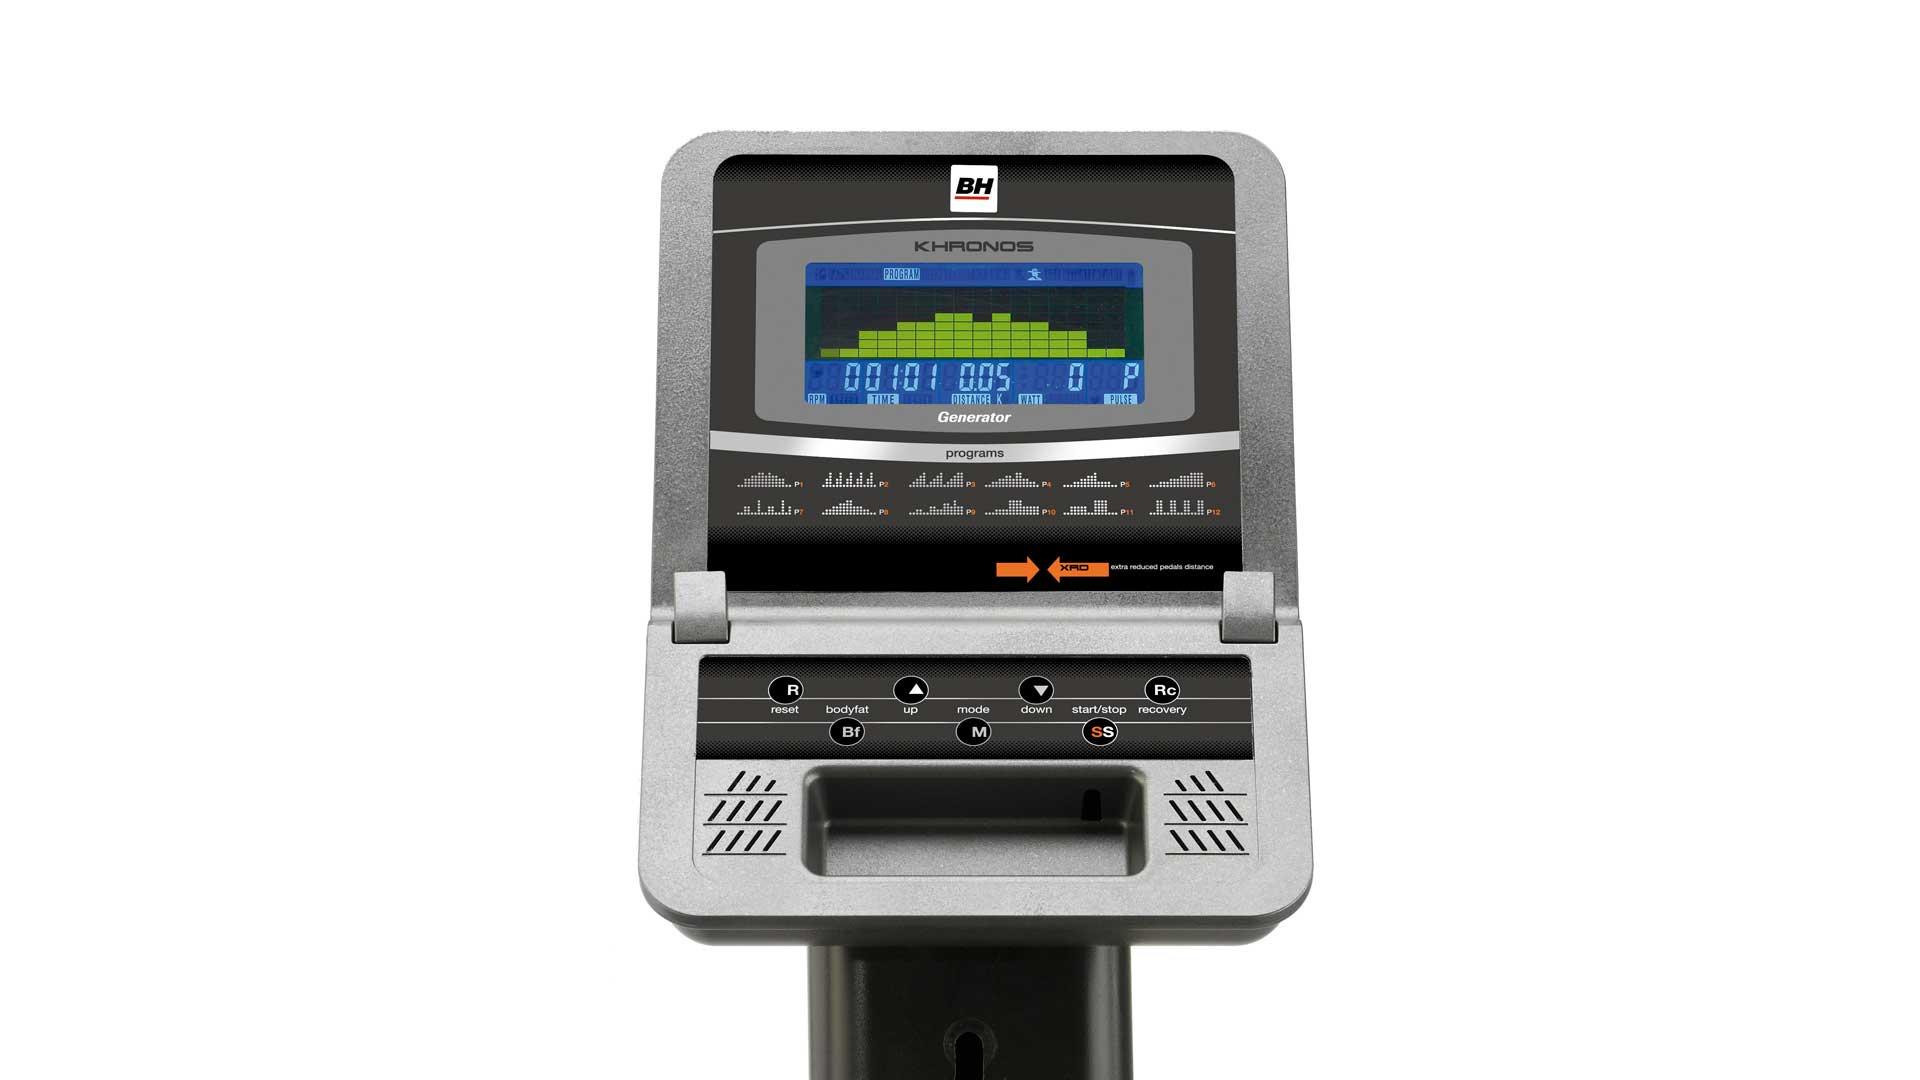 Khronos Generator G260